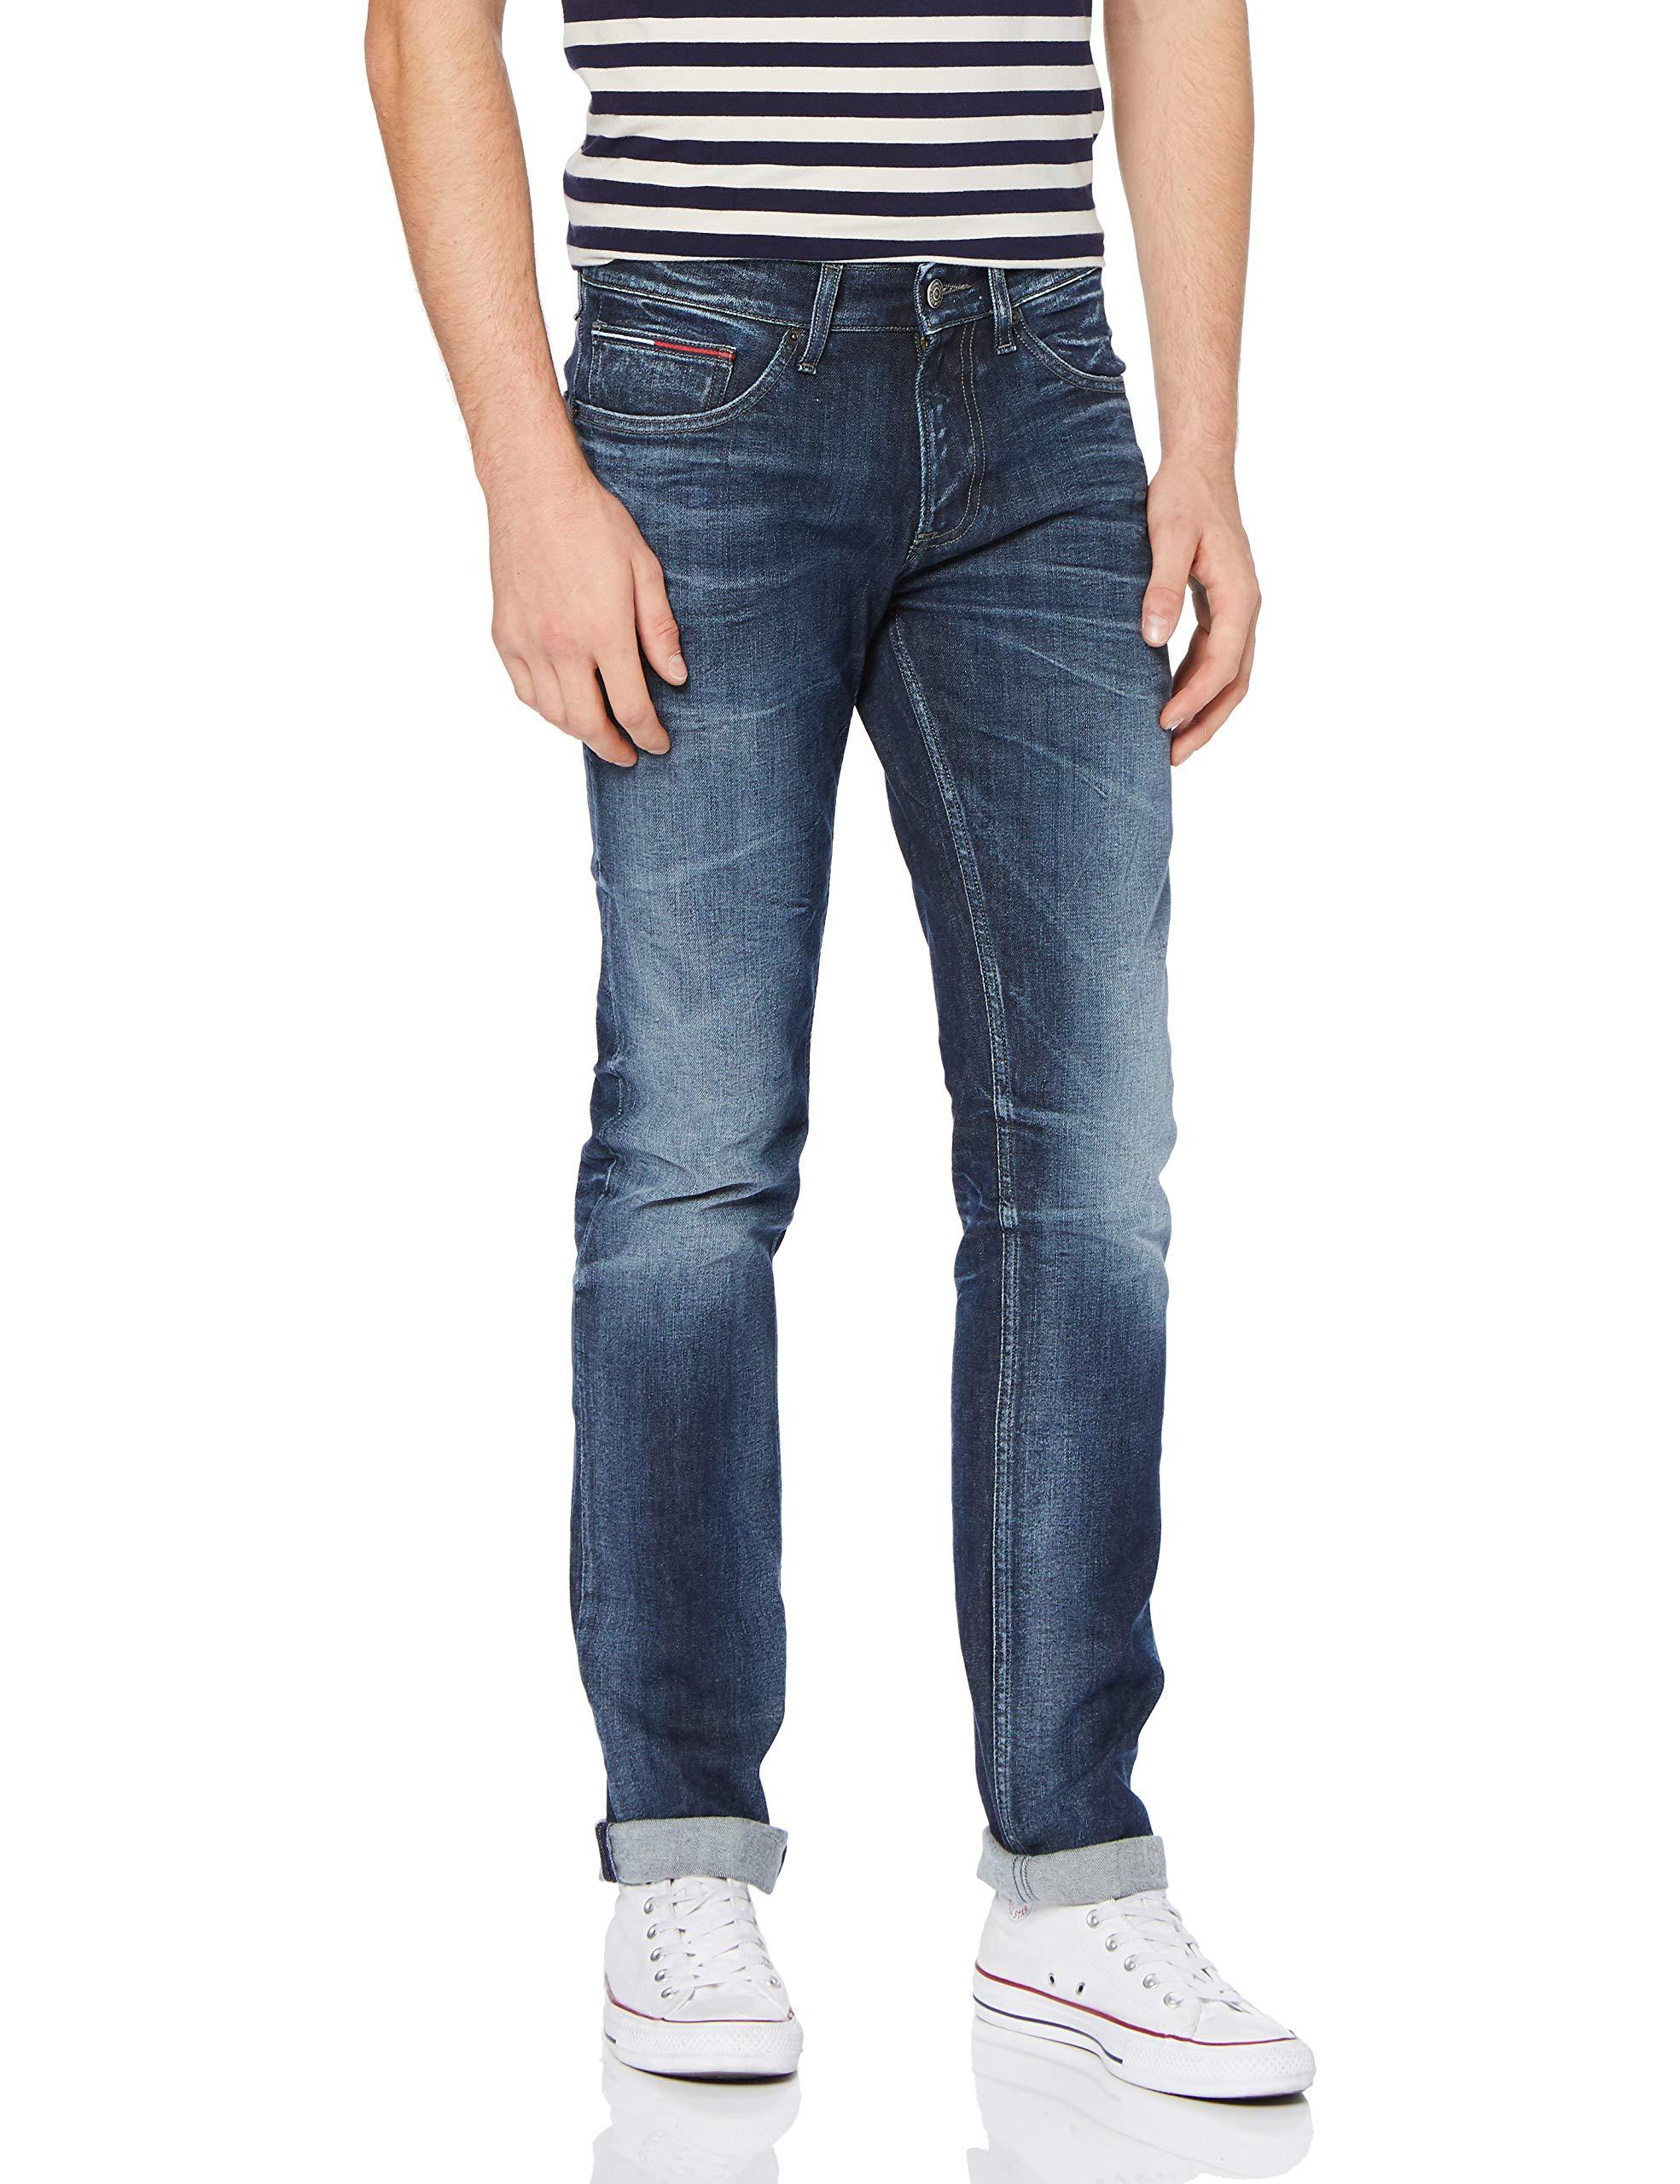 Tommy Dark Du JeanBleuraily 34ltaille Rlyd Bl Fabricant3436Homme Slim X Scanton Str Jeans 91136w m8nwvN0